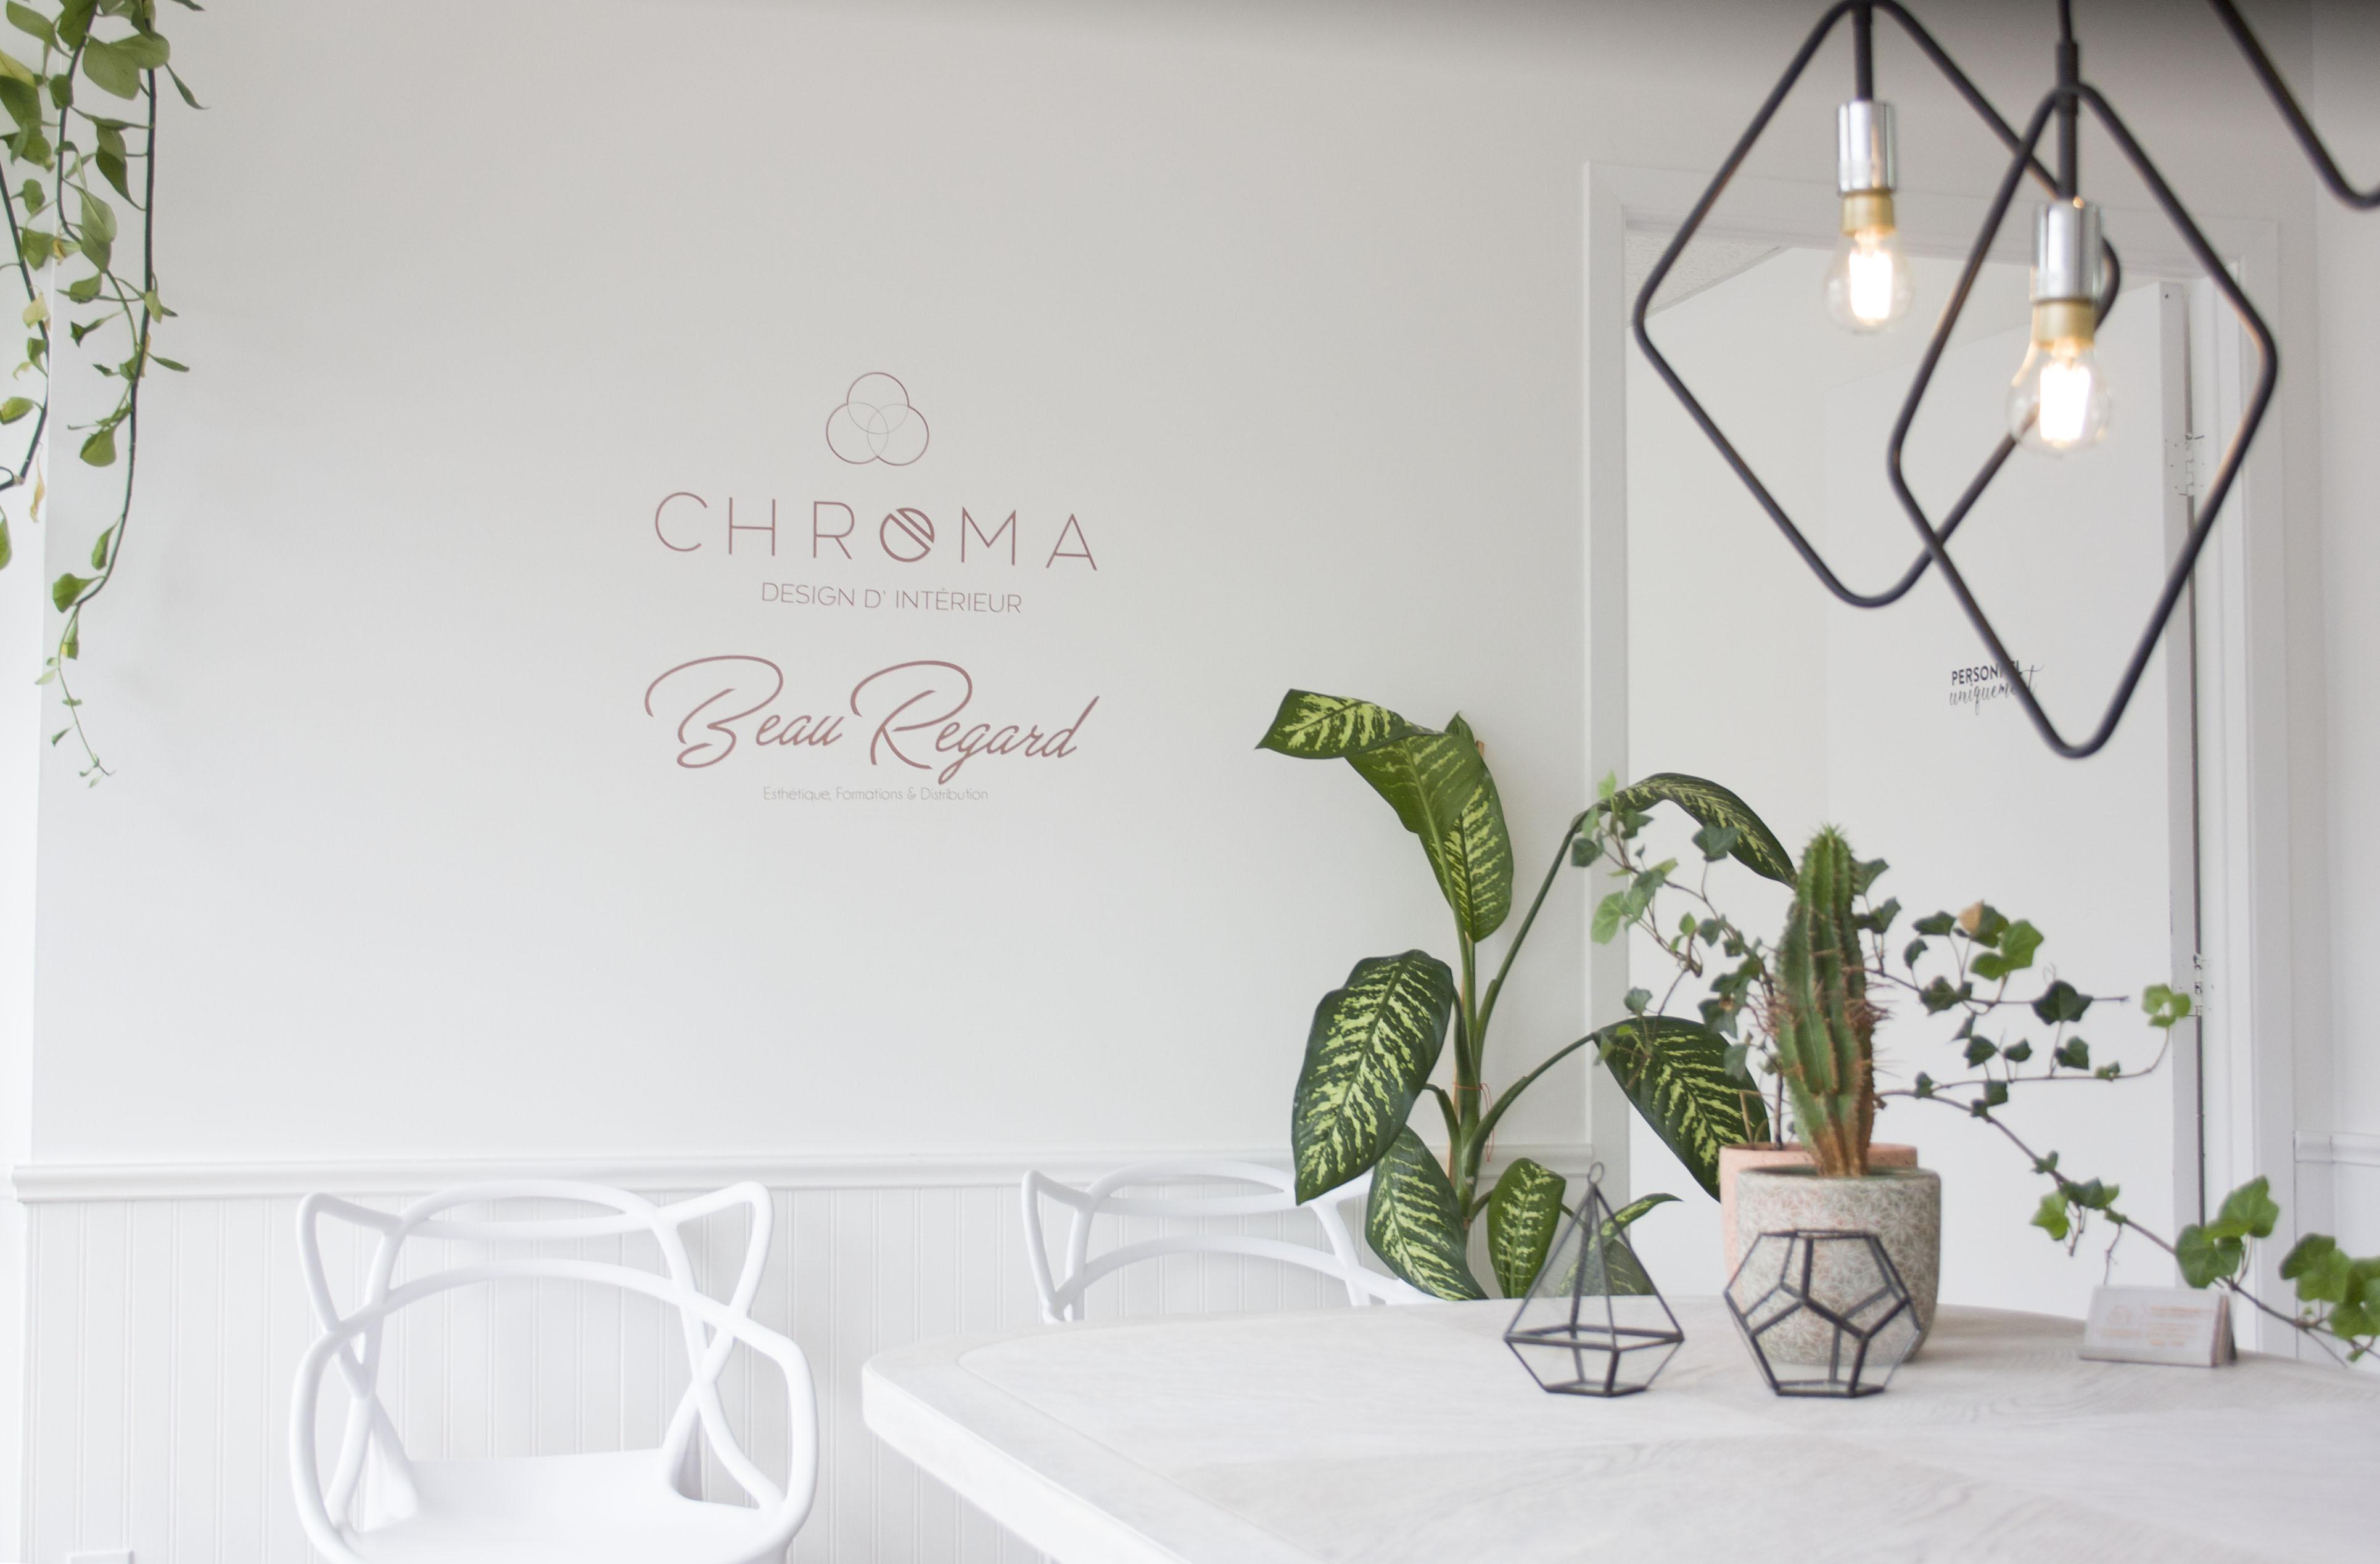 CHROMA3